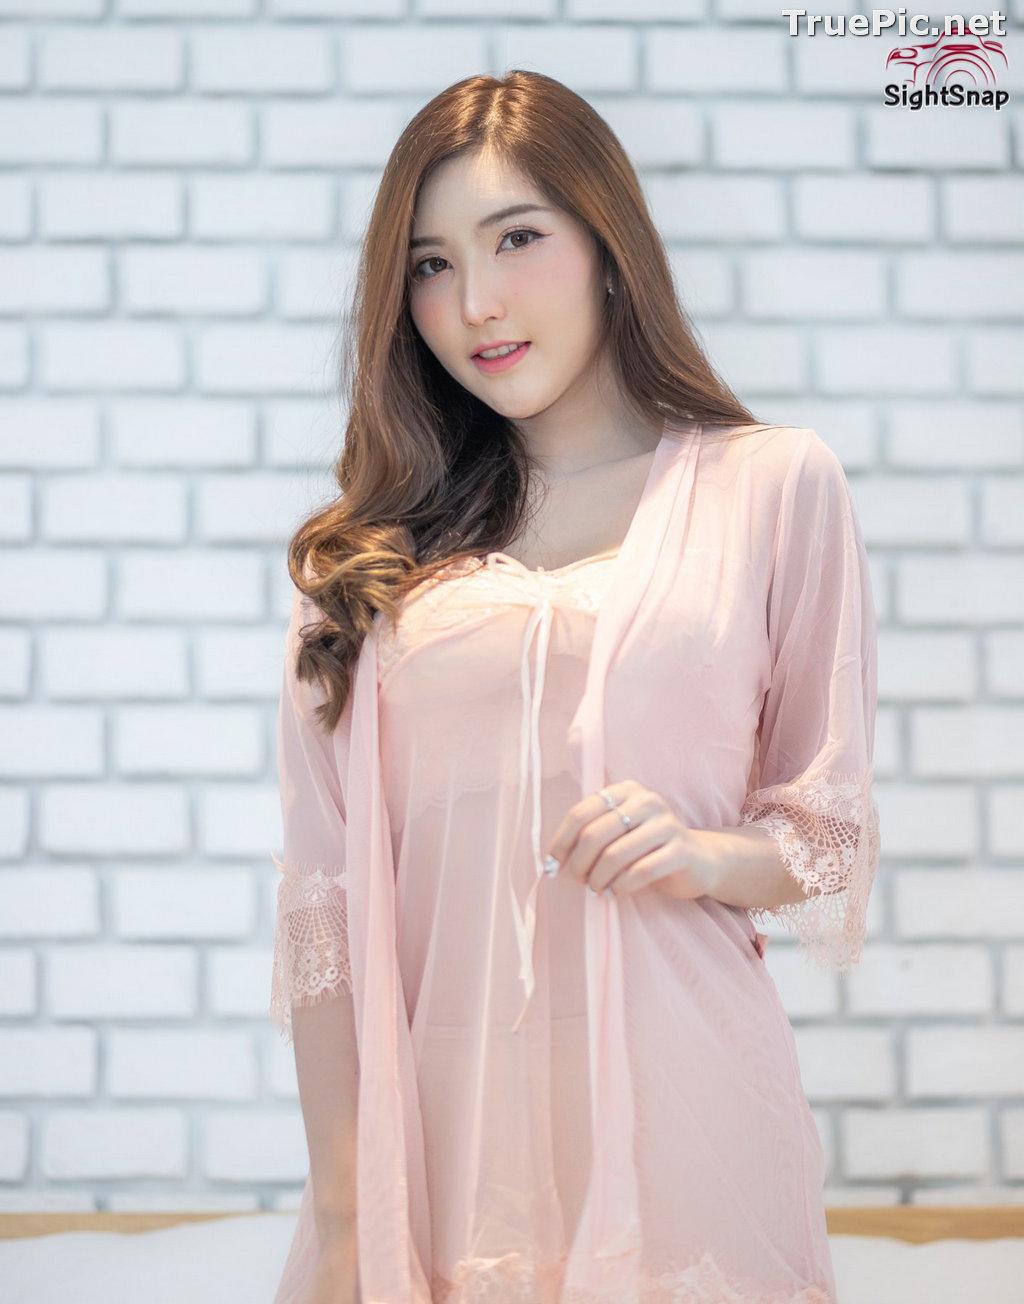 Image Thailand Model - Luc Kie - Nice Pink Love Night Dress - TruePic.net - Picture-1